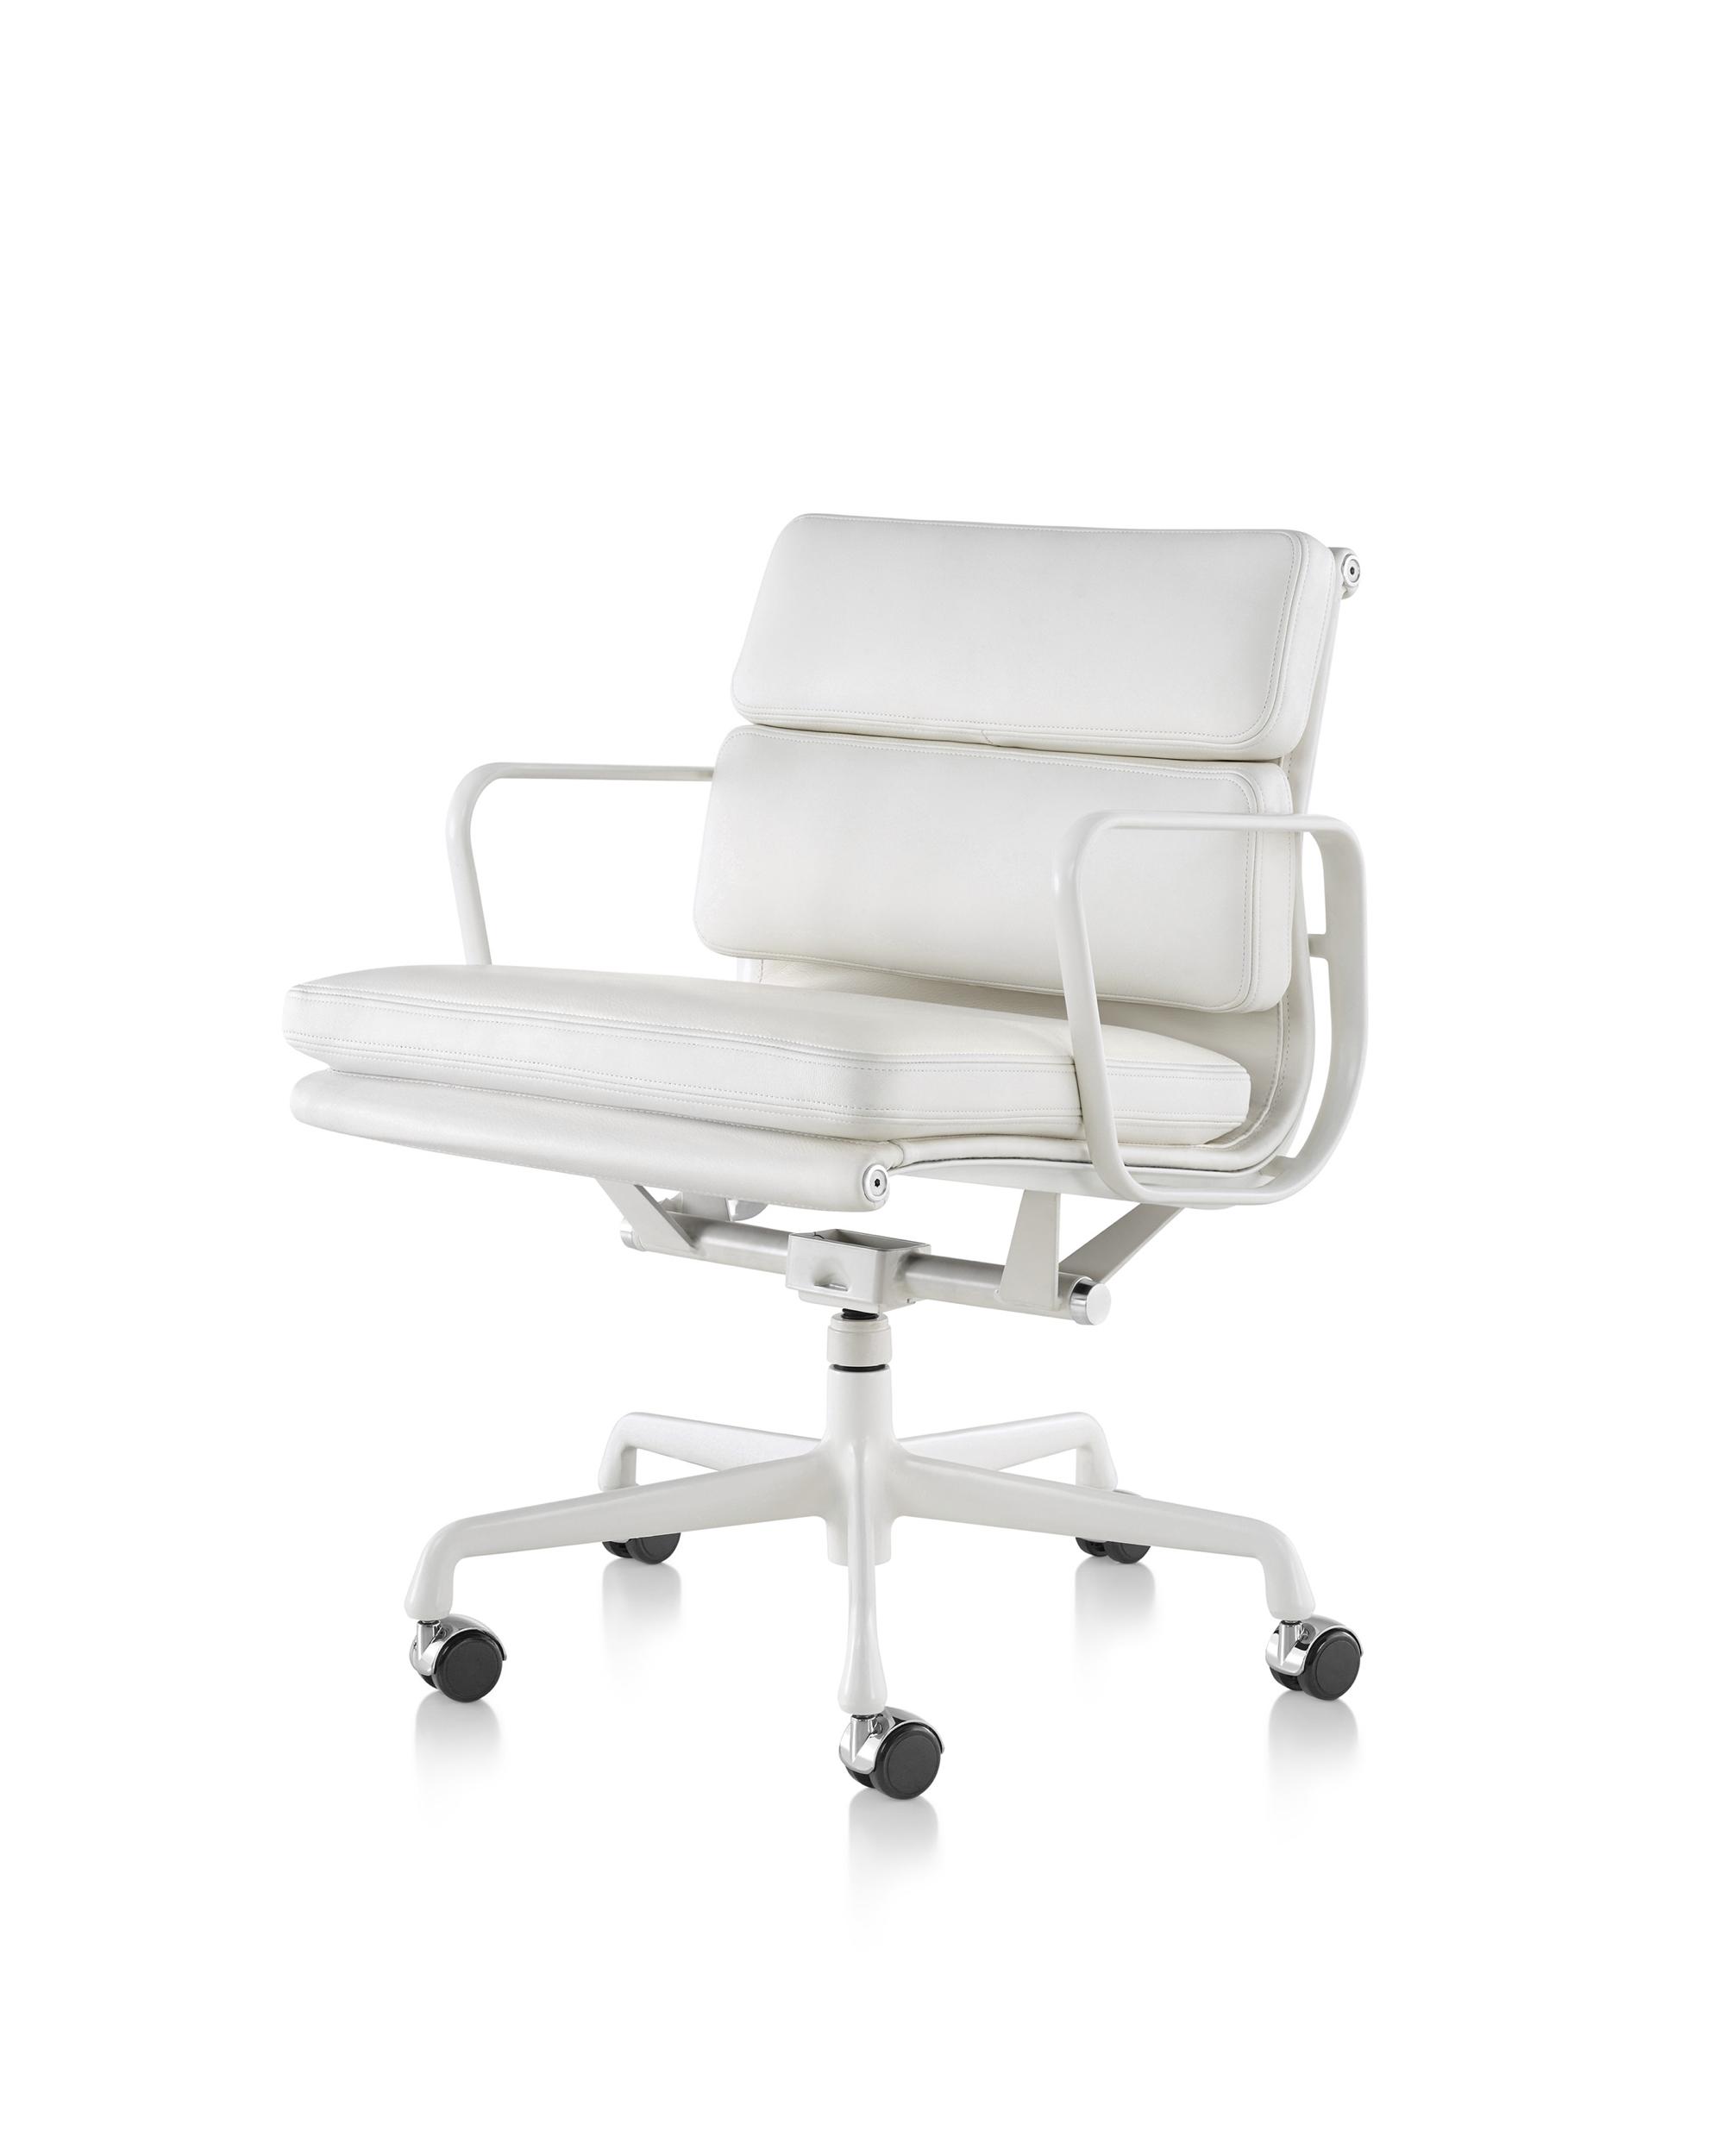 Стулья для офиса, фото модели Eames. Фото 2